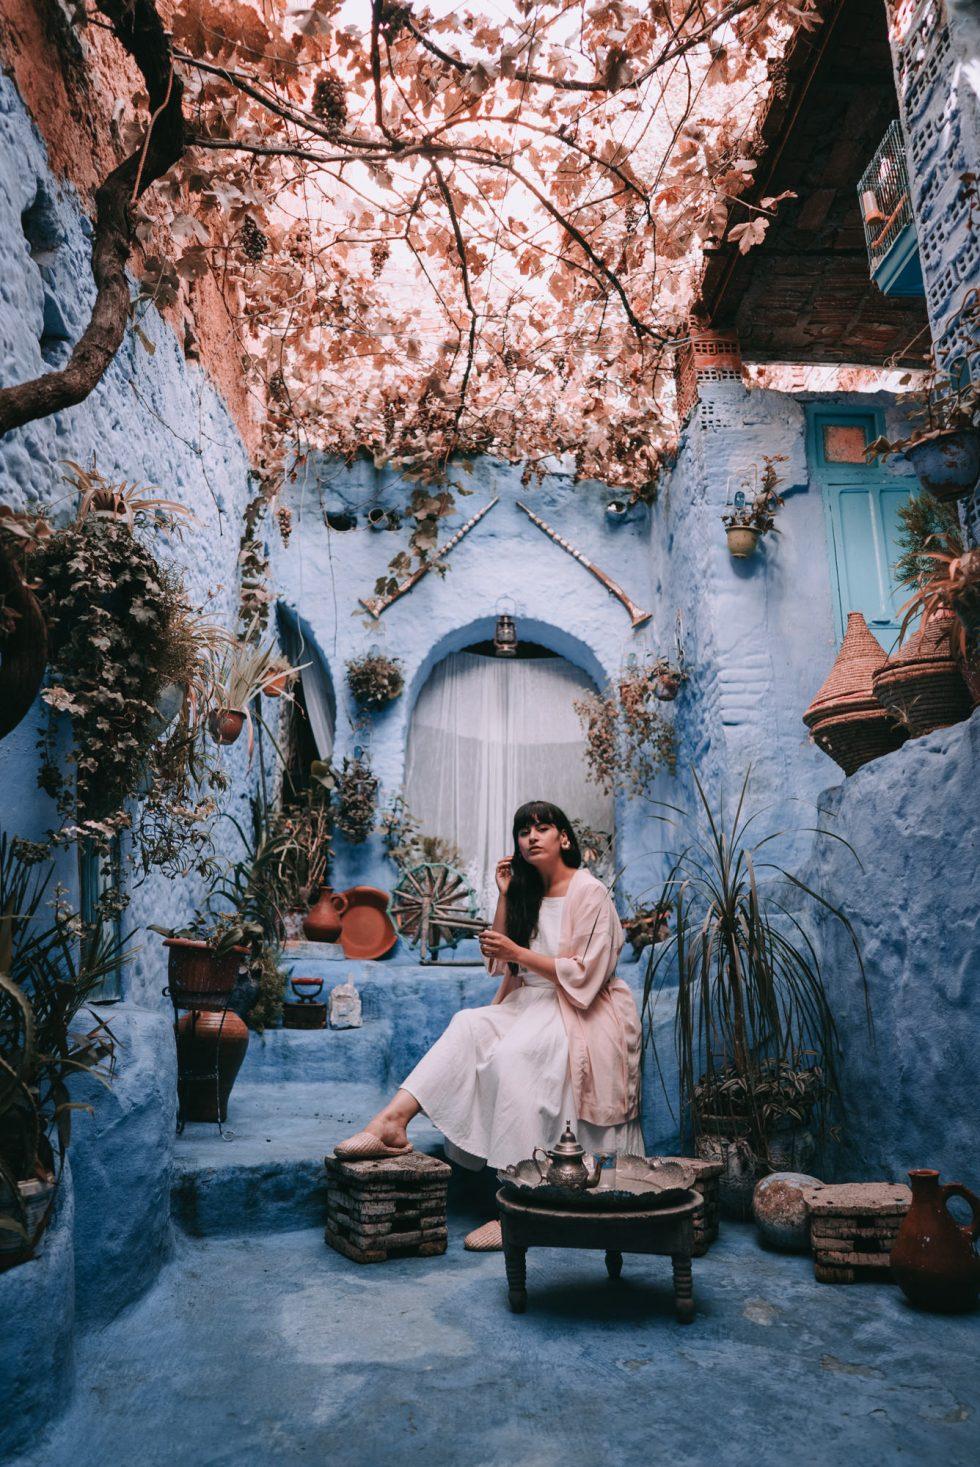 chefchaouen-blue-city-morocco-travel-lifestyle-photographer-laura-g-diaz